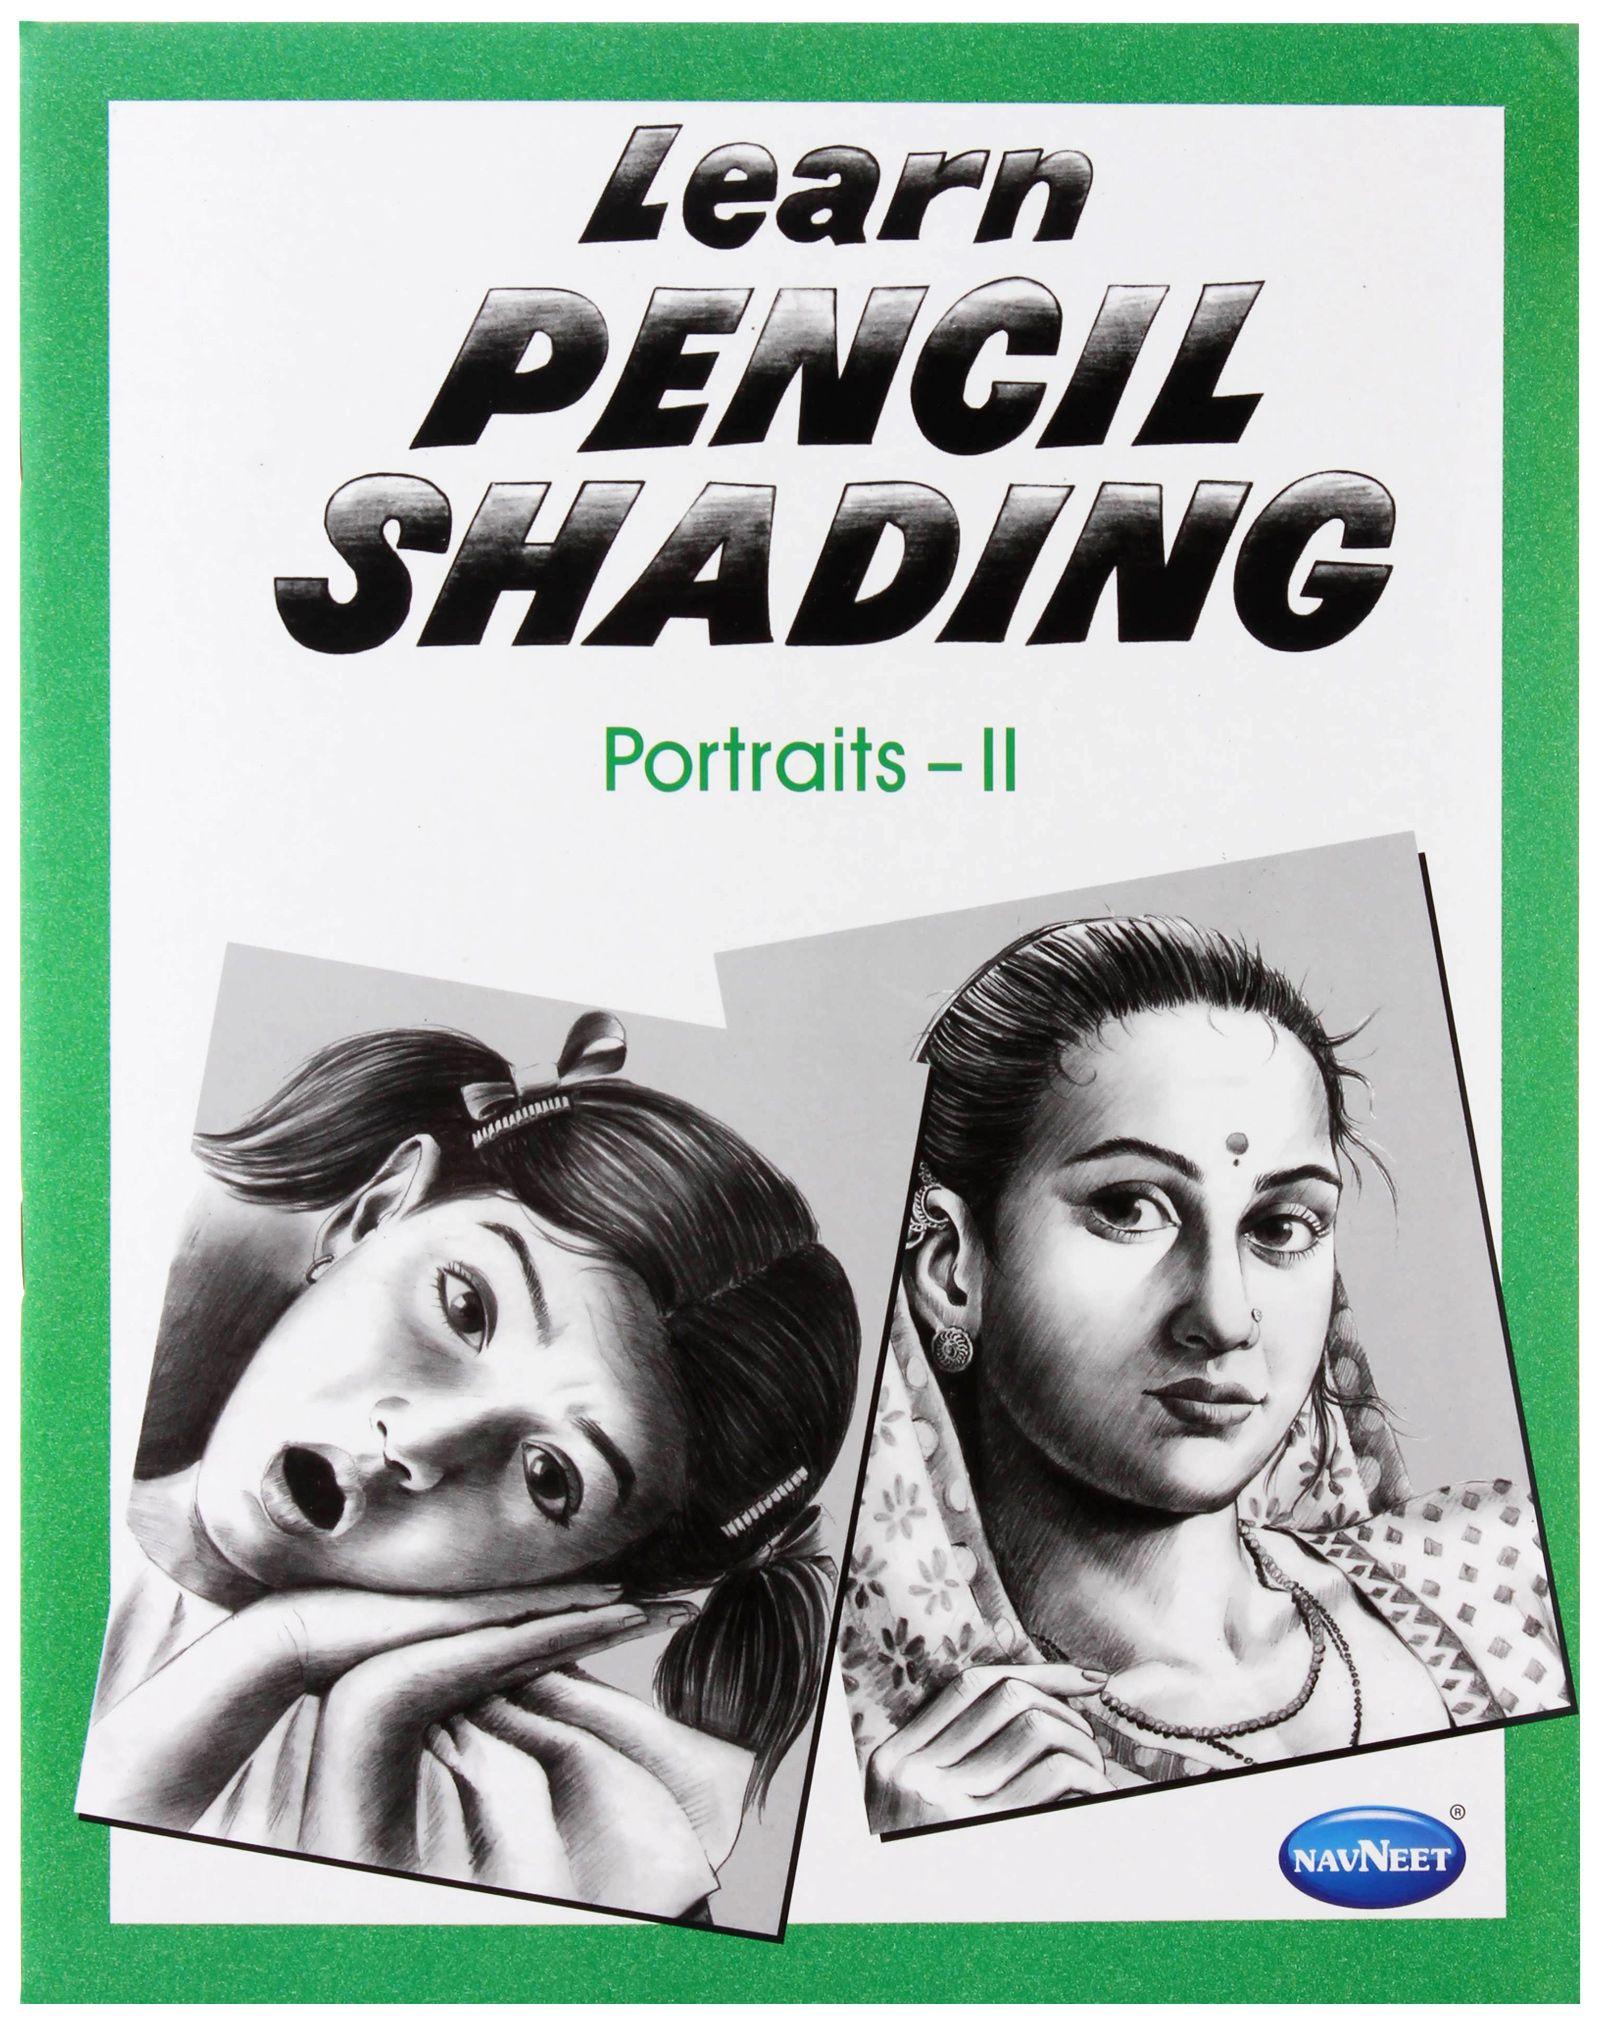 pencil shading techniques pdf